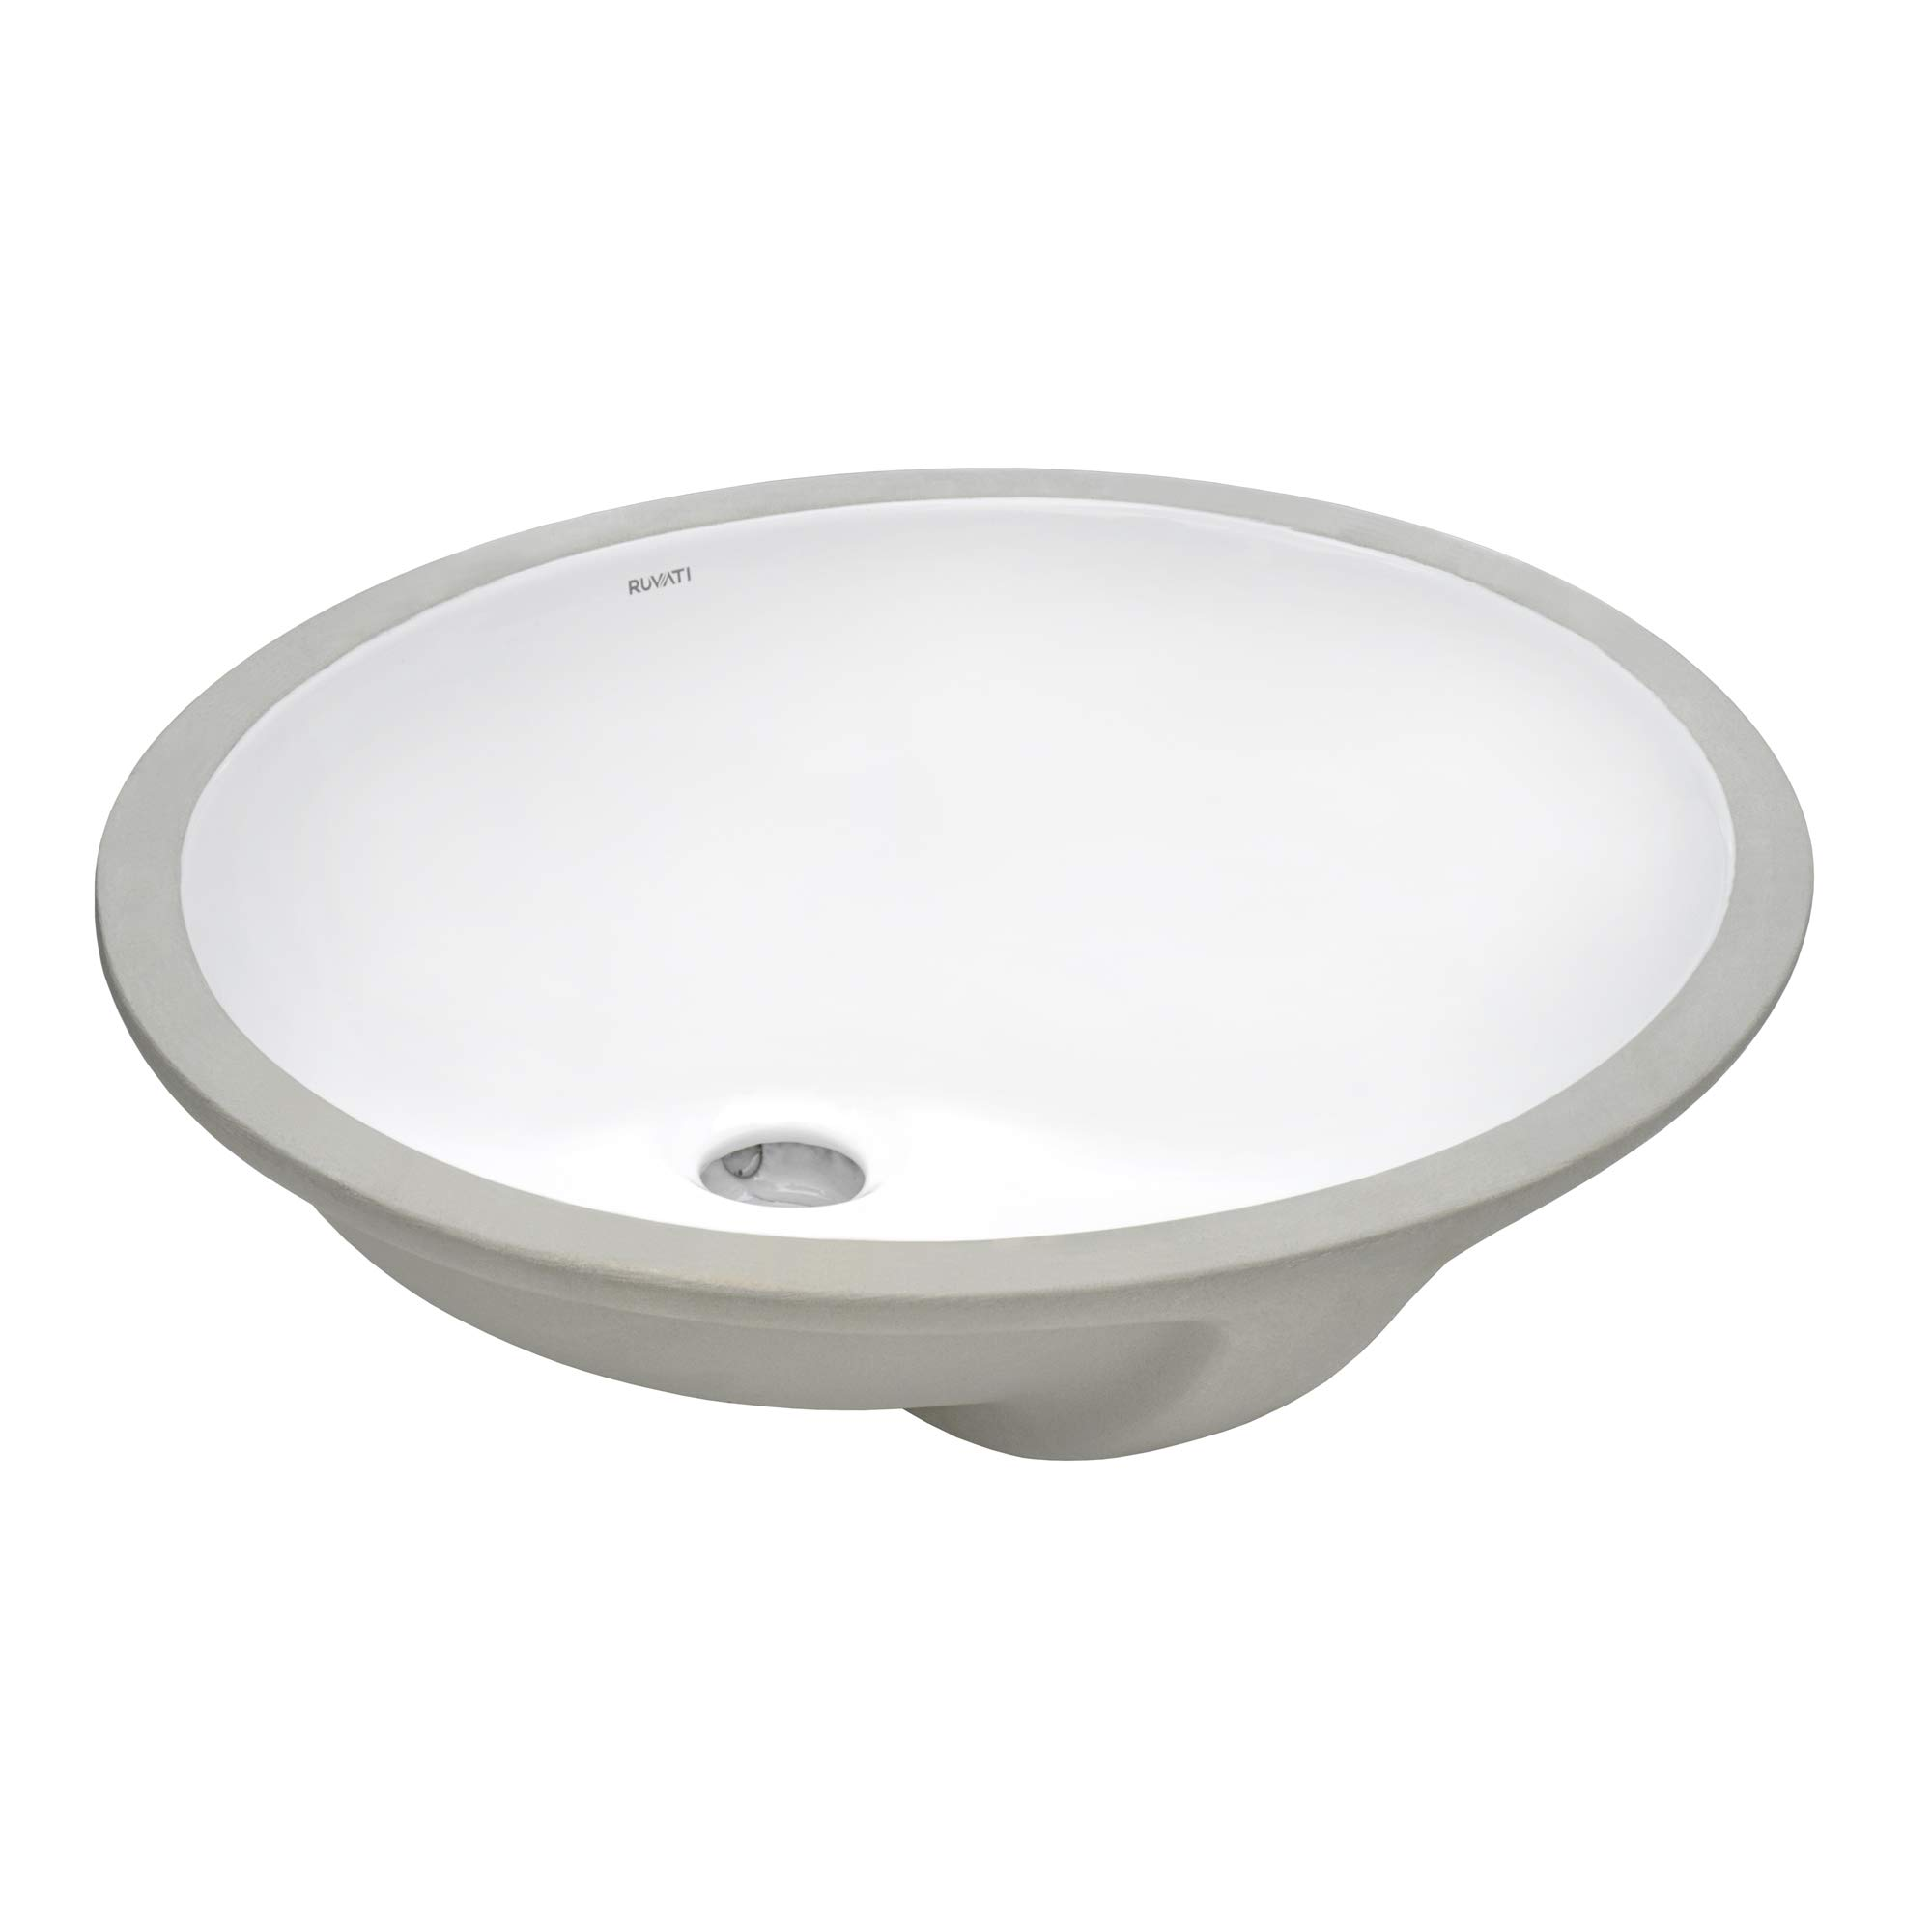 Ruvati 16 X 13 Inch Undermount Bathroom Vanity Sink White Oval Porcelain Ceramic With Overflow Rvb0616 Amazon Com